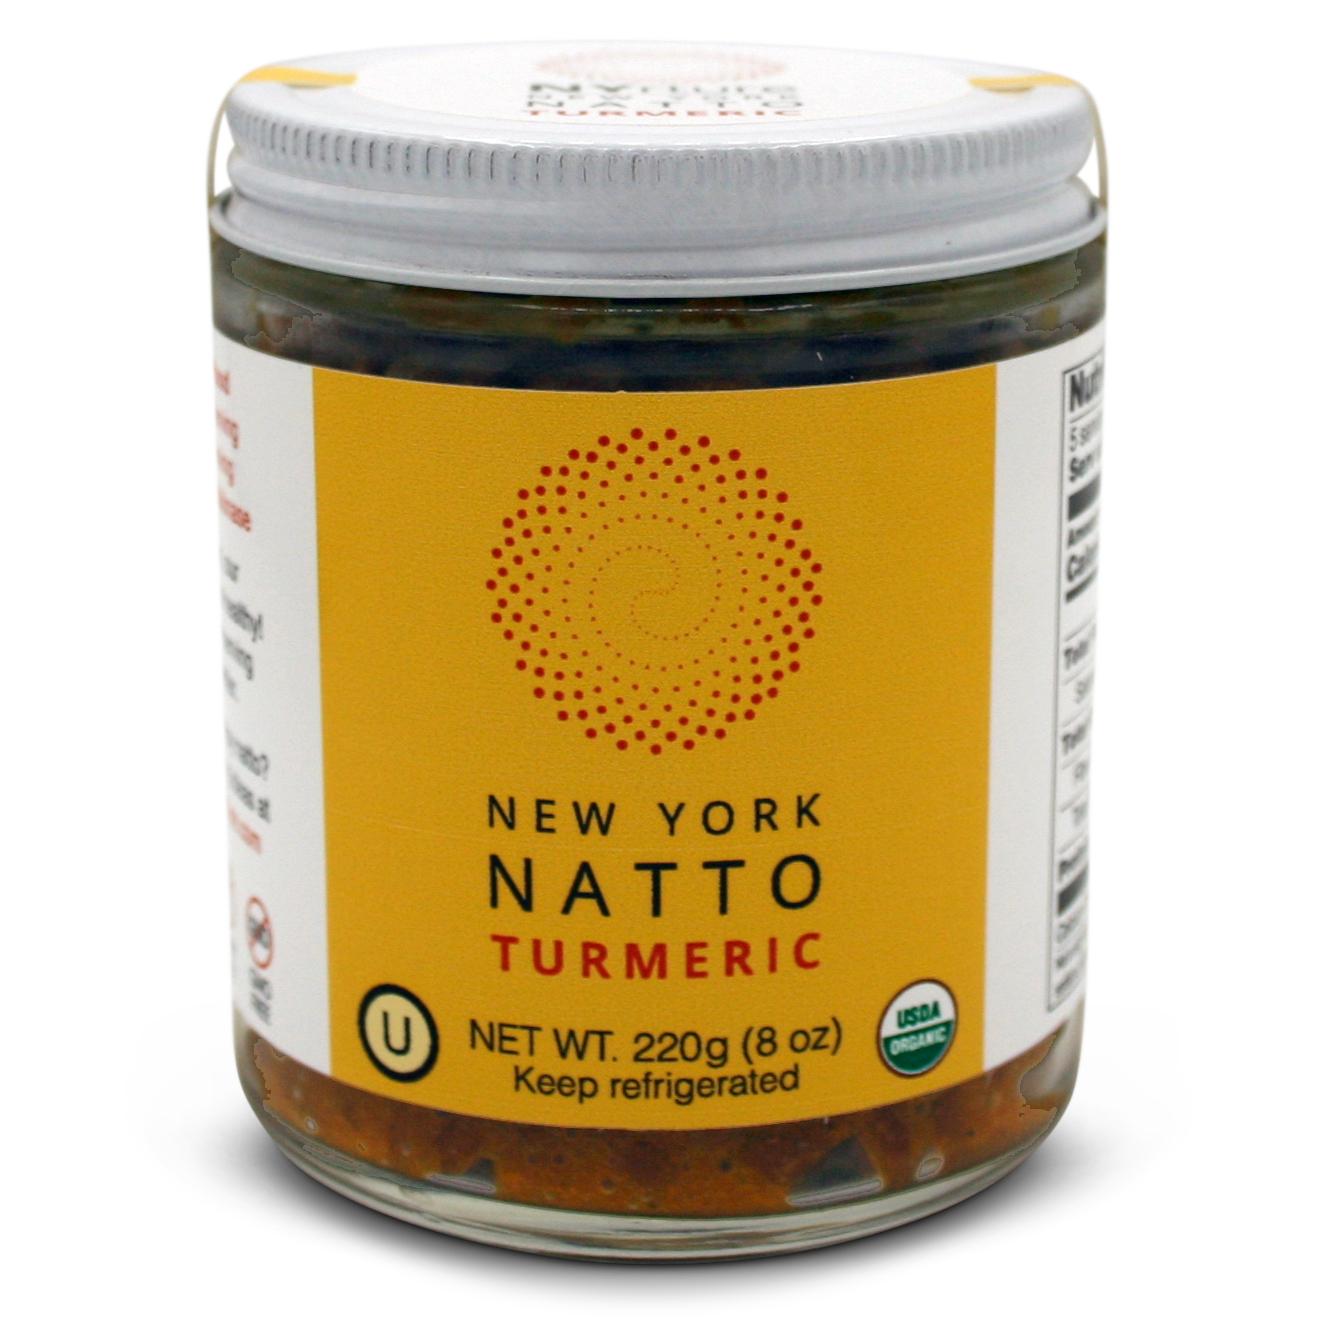 New York Natto Turmeric - front.jpg